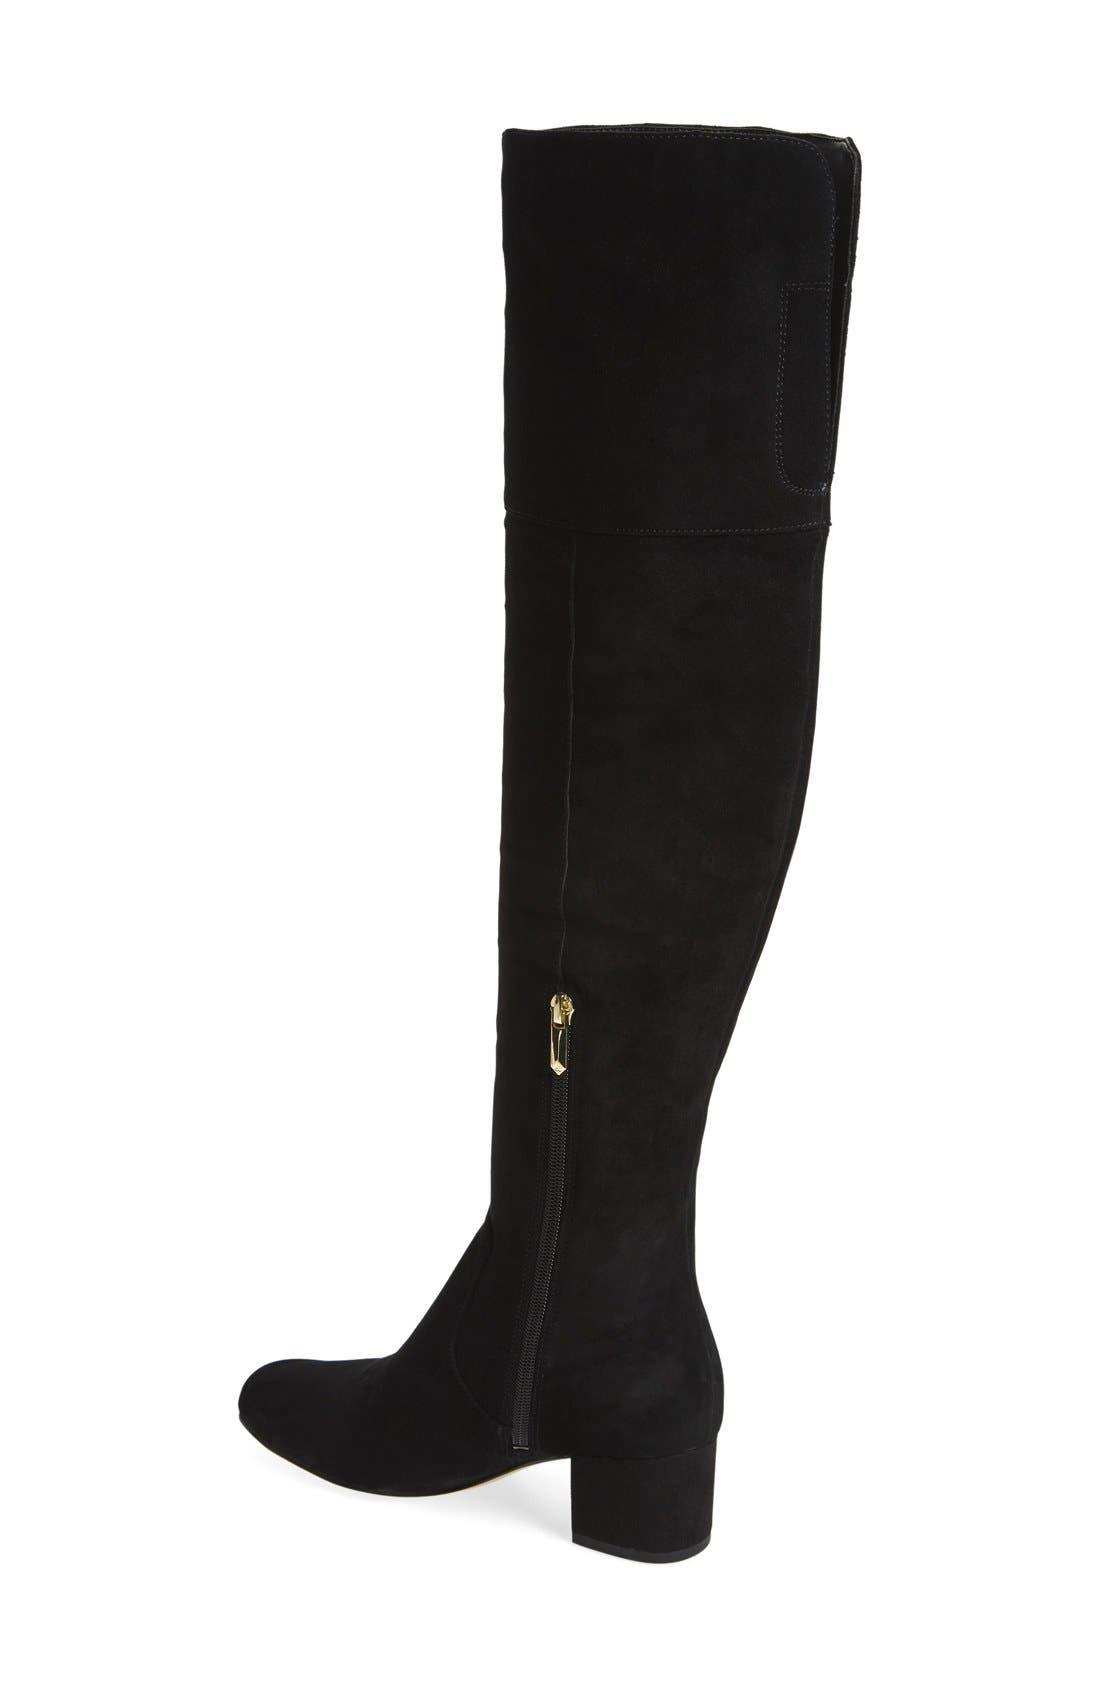 Alternate Image 2  - Sam Edelman 'Elina' Over the Knee Boot (Women)